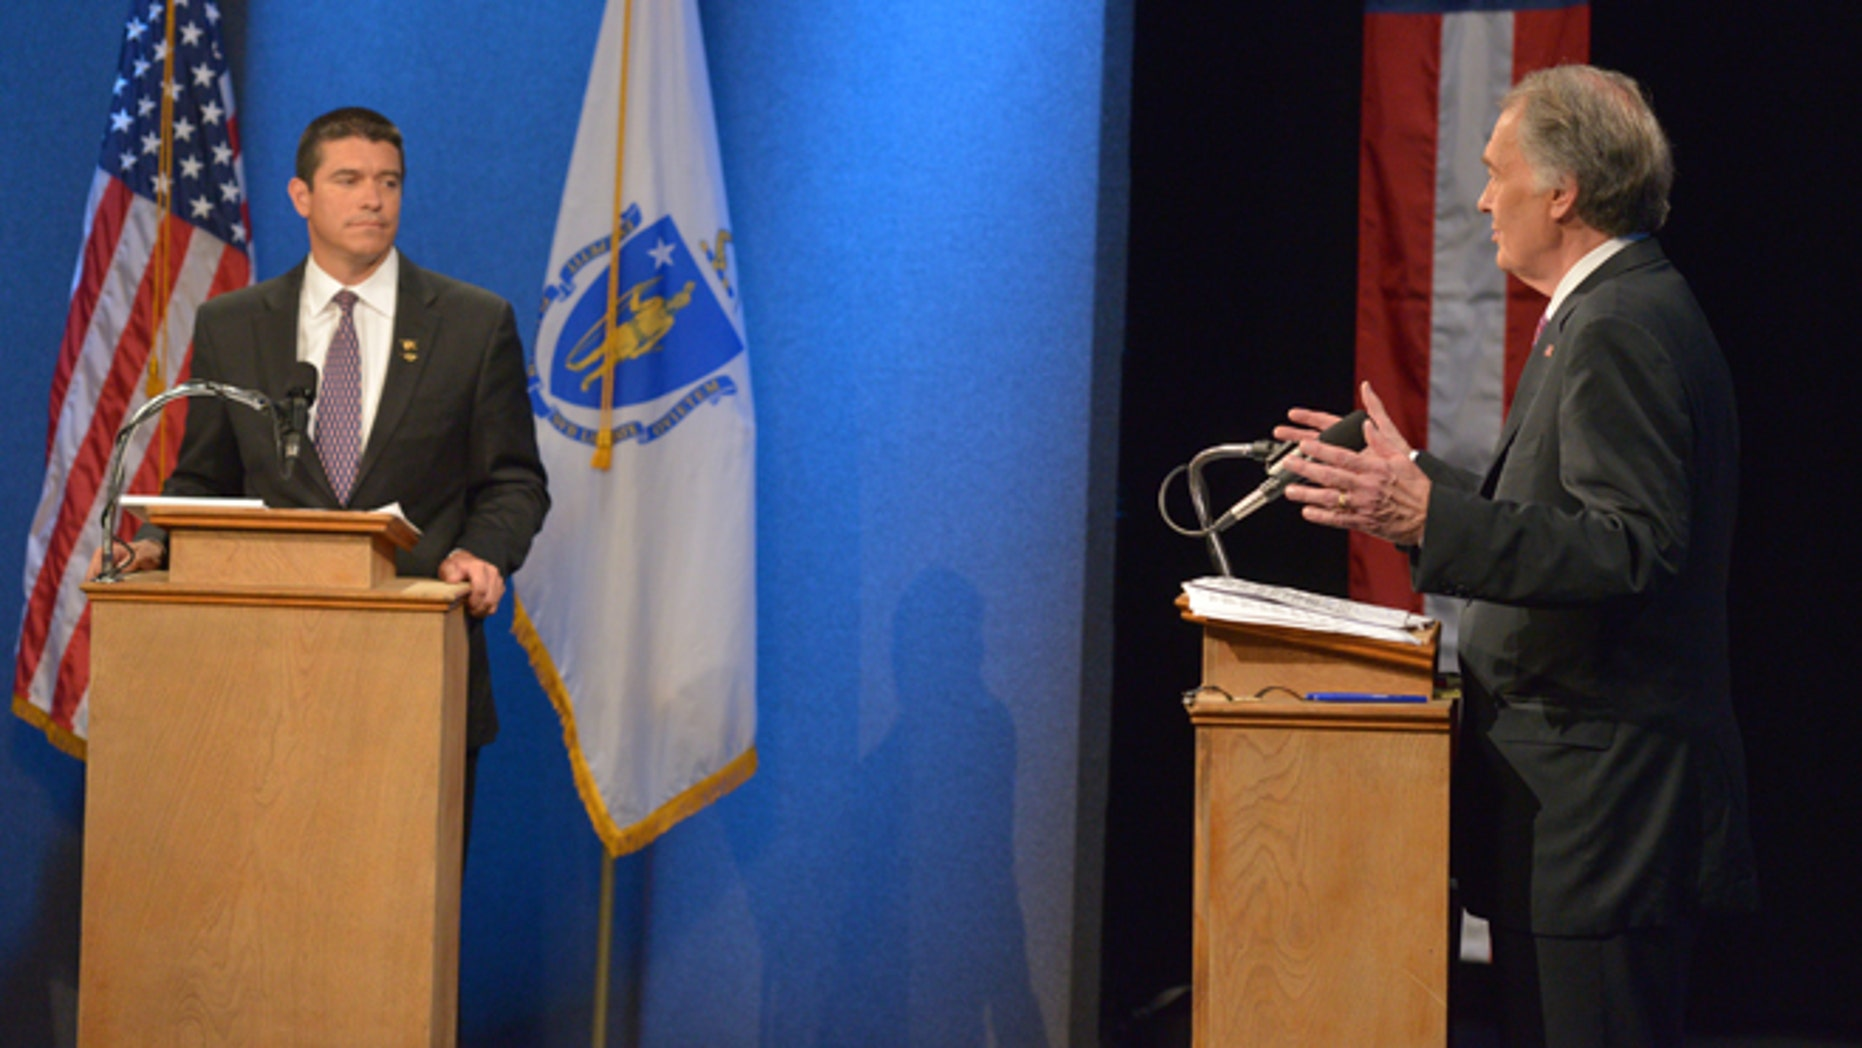 Democratic Congressman Edward Markey, right, and Republican Gabriel Gomez, left.